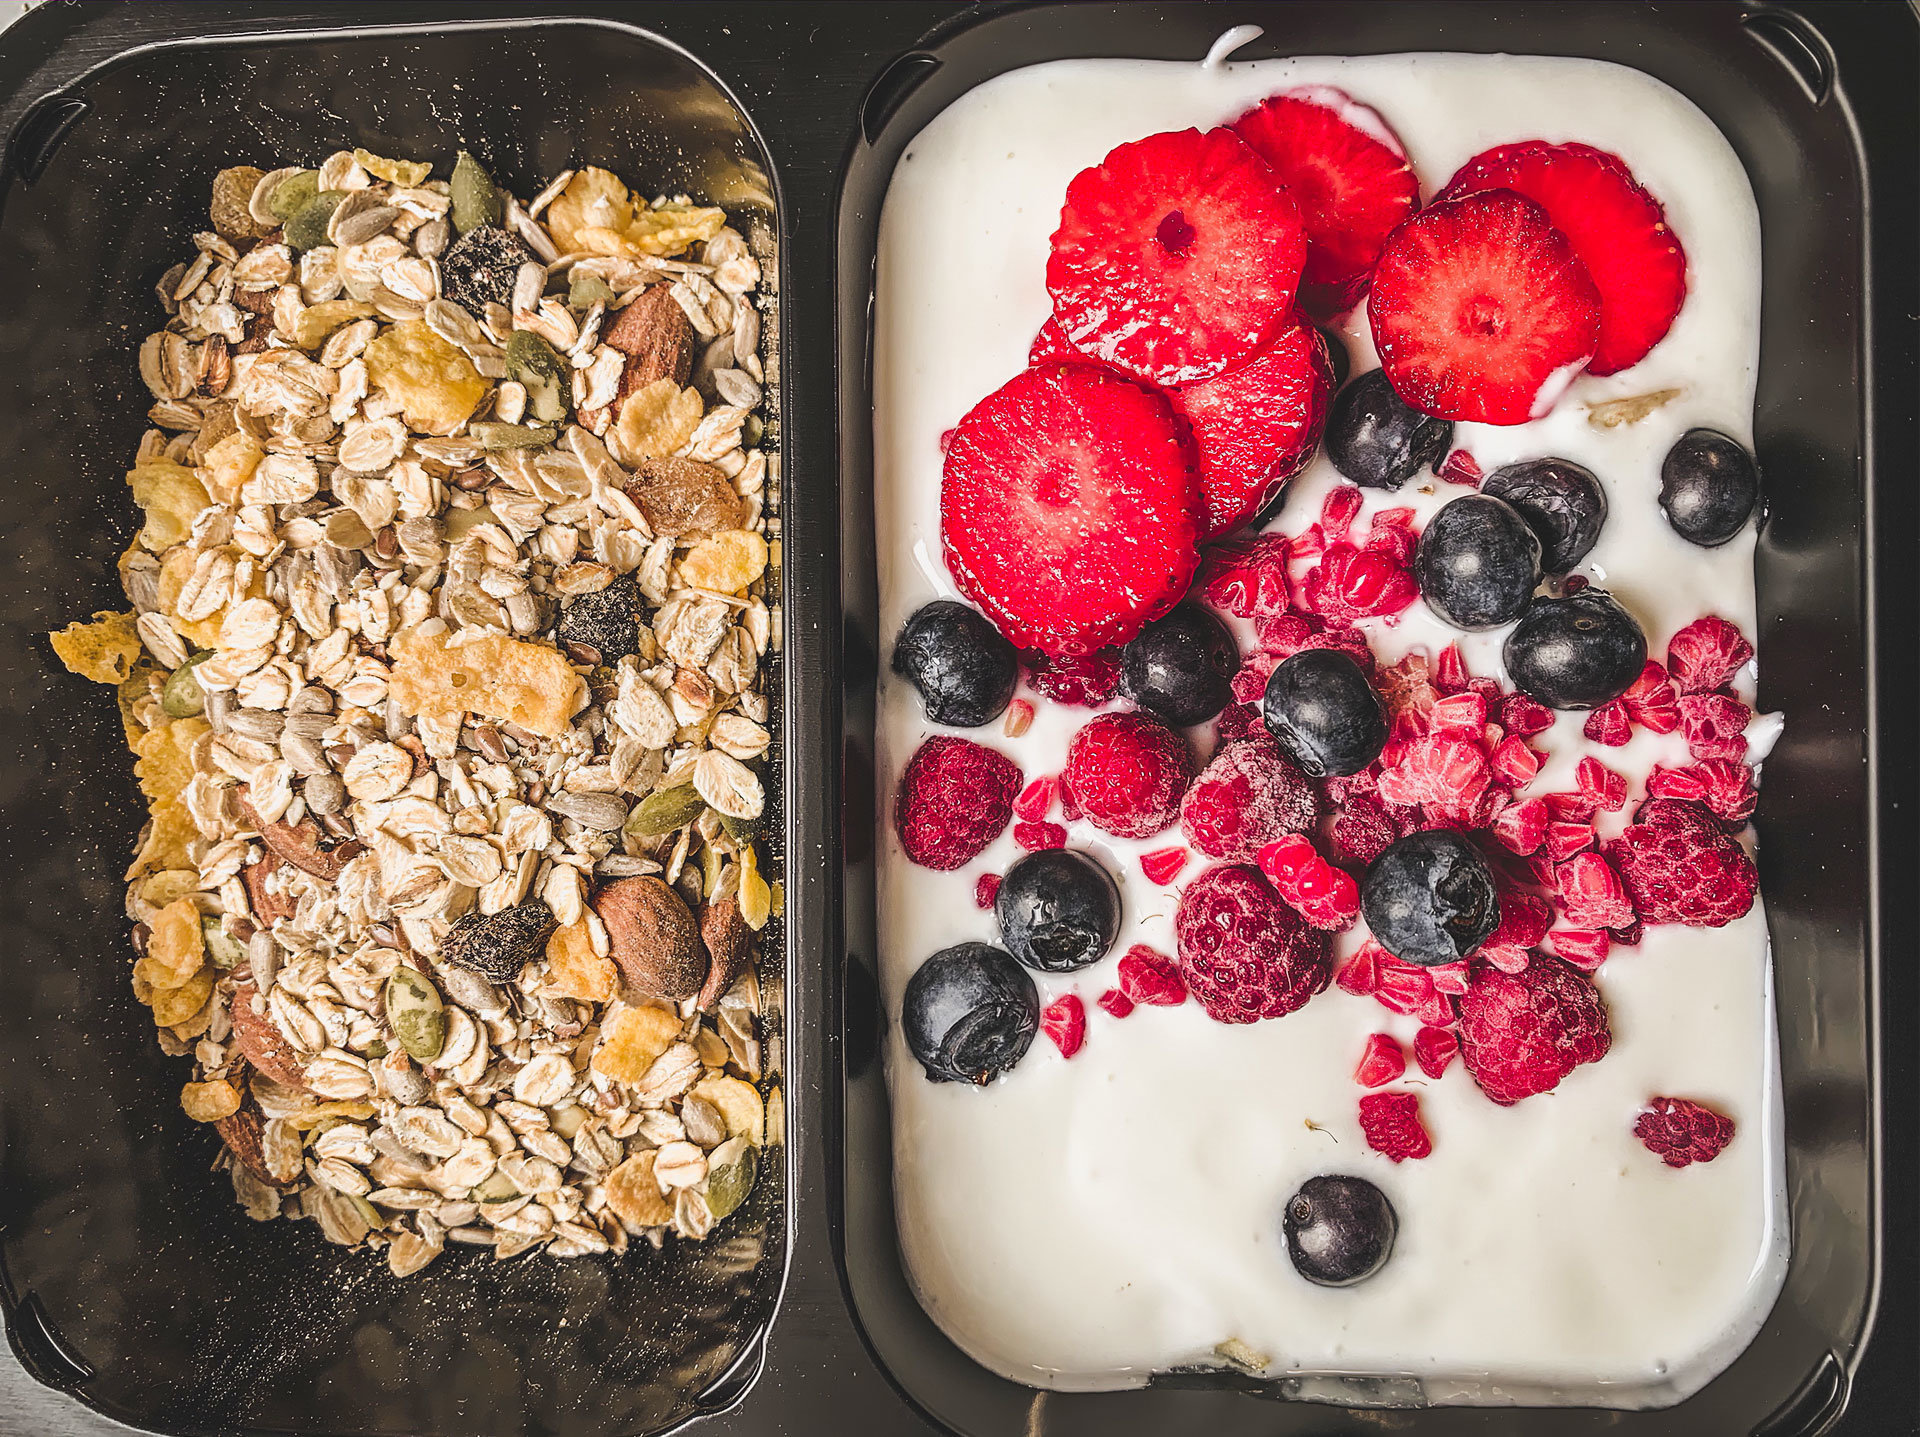 Obrazek Dieta bez glutenu i laktozy na 5 dni 2000 kalorii